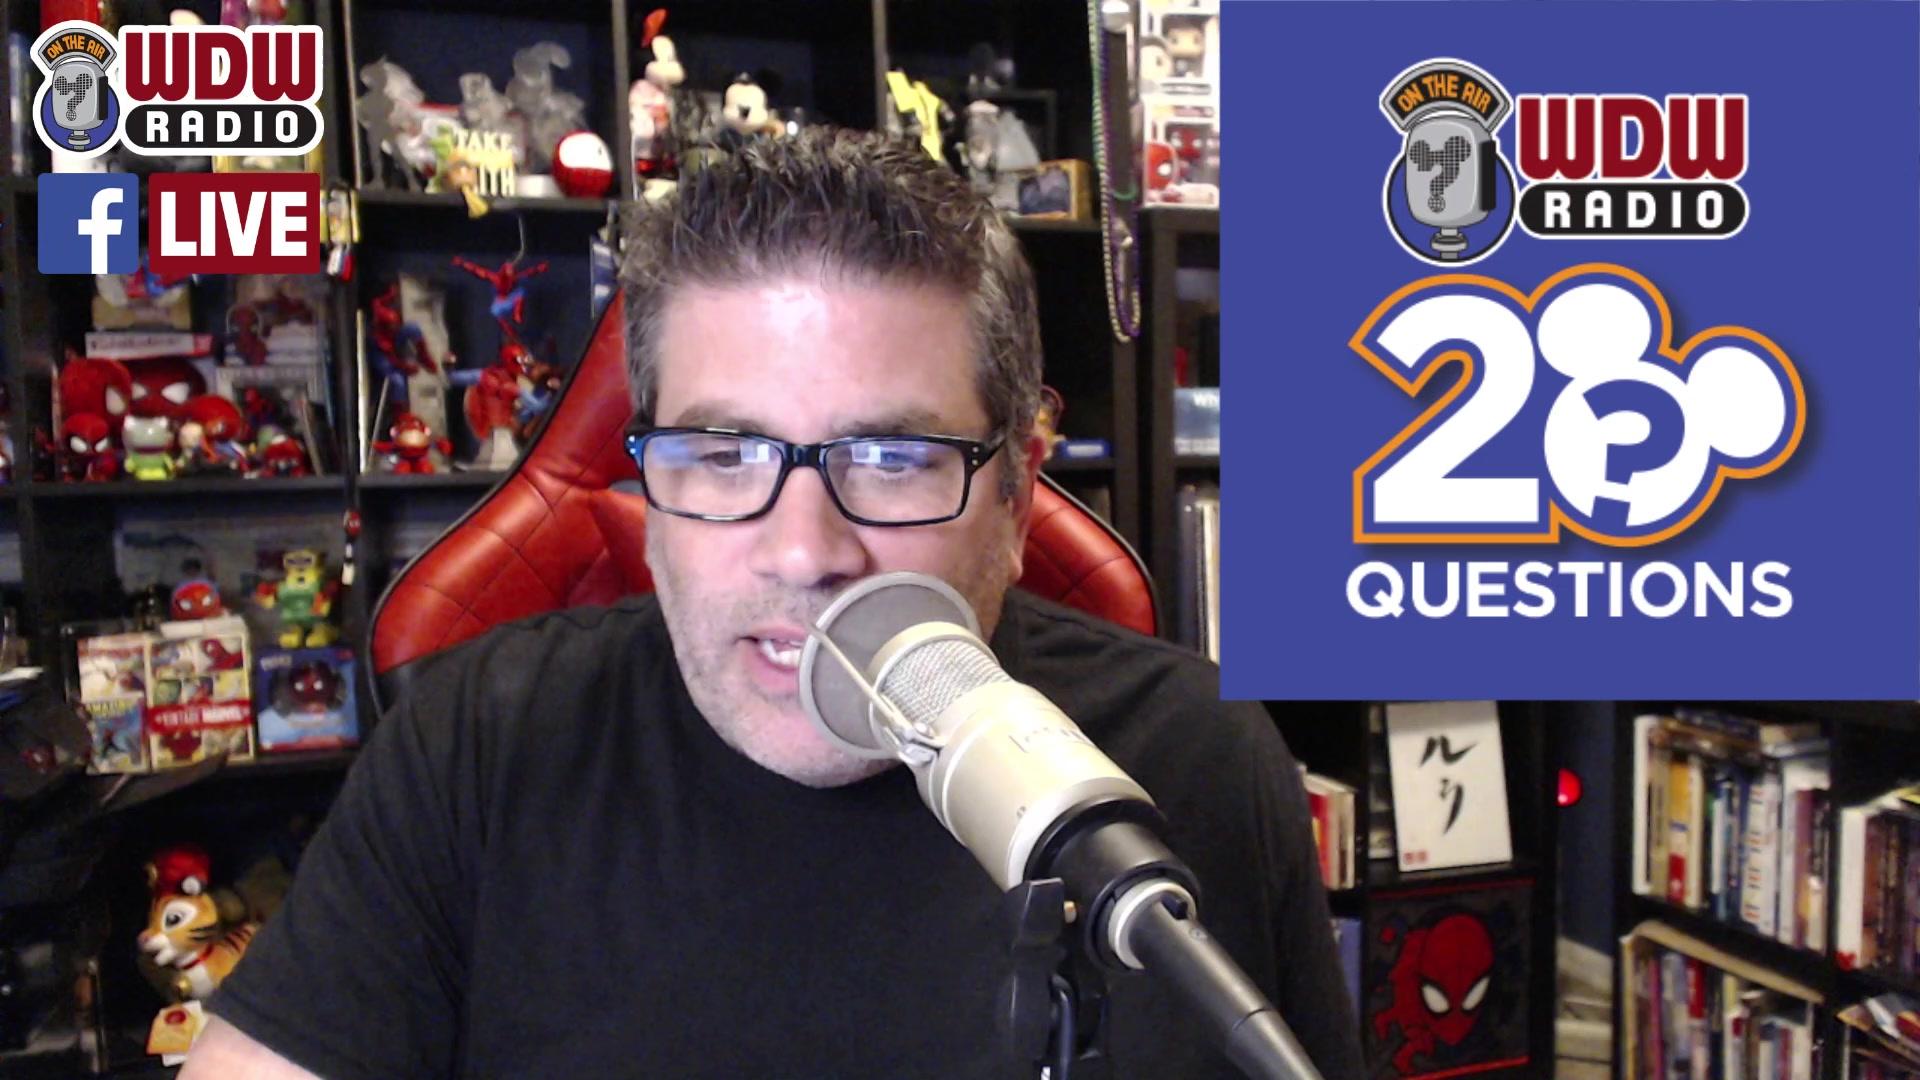 WDW Radio LIVE – Call in Q&A and WIN Baby Yoda socks!